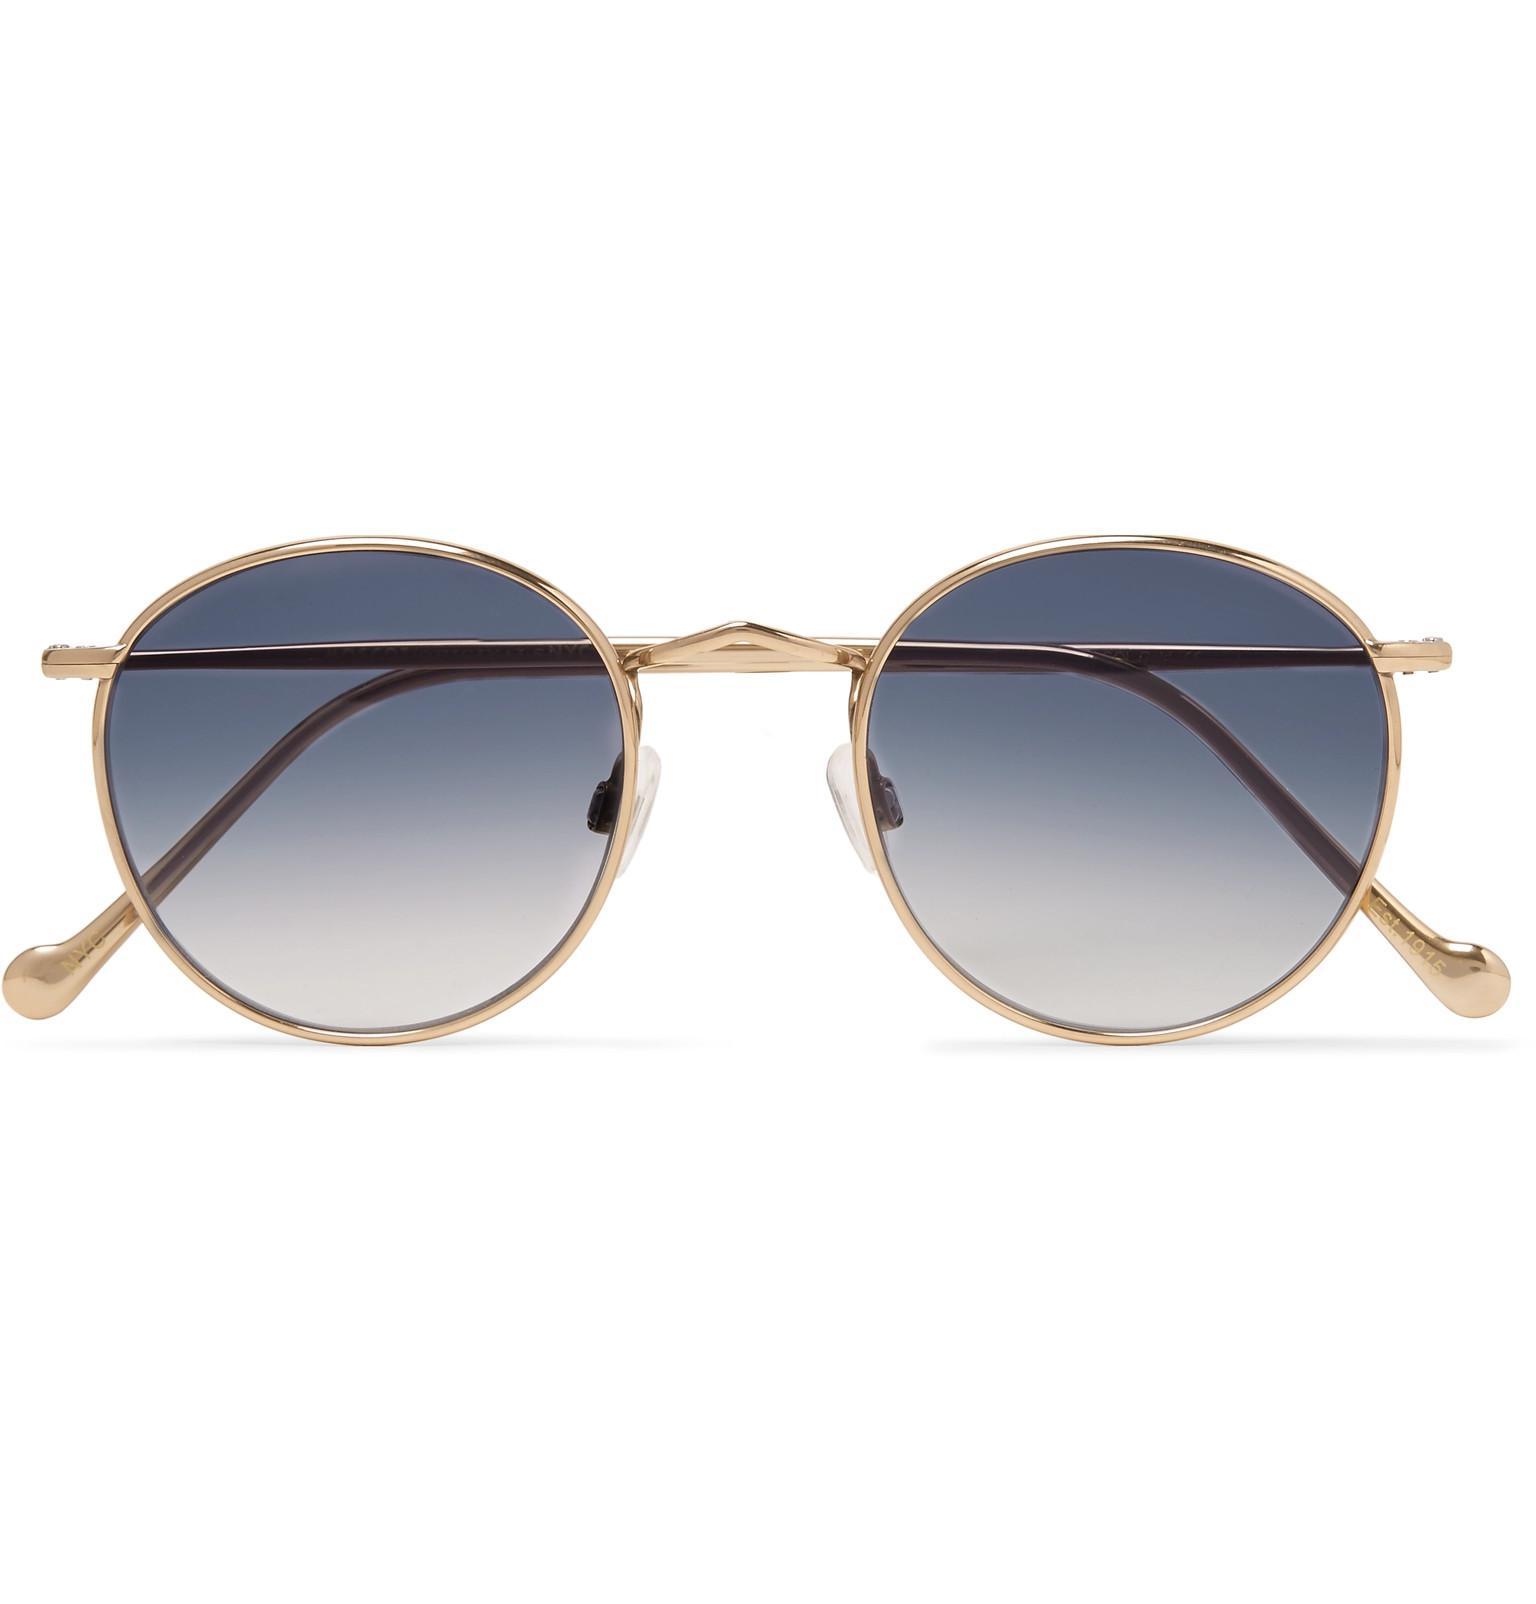 2258477c530 Lyst - Moscot Zev Round-frame Gold-tone Titanium Sunglasses in ...